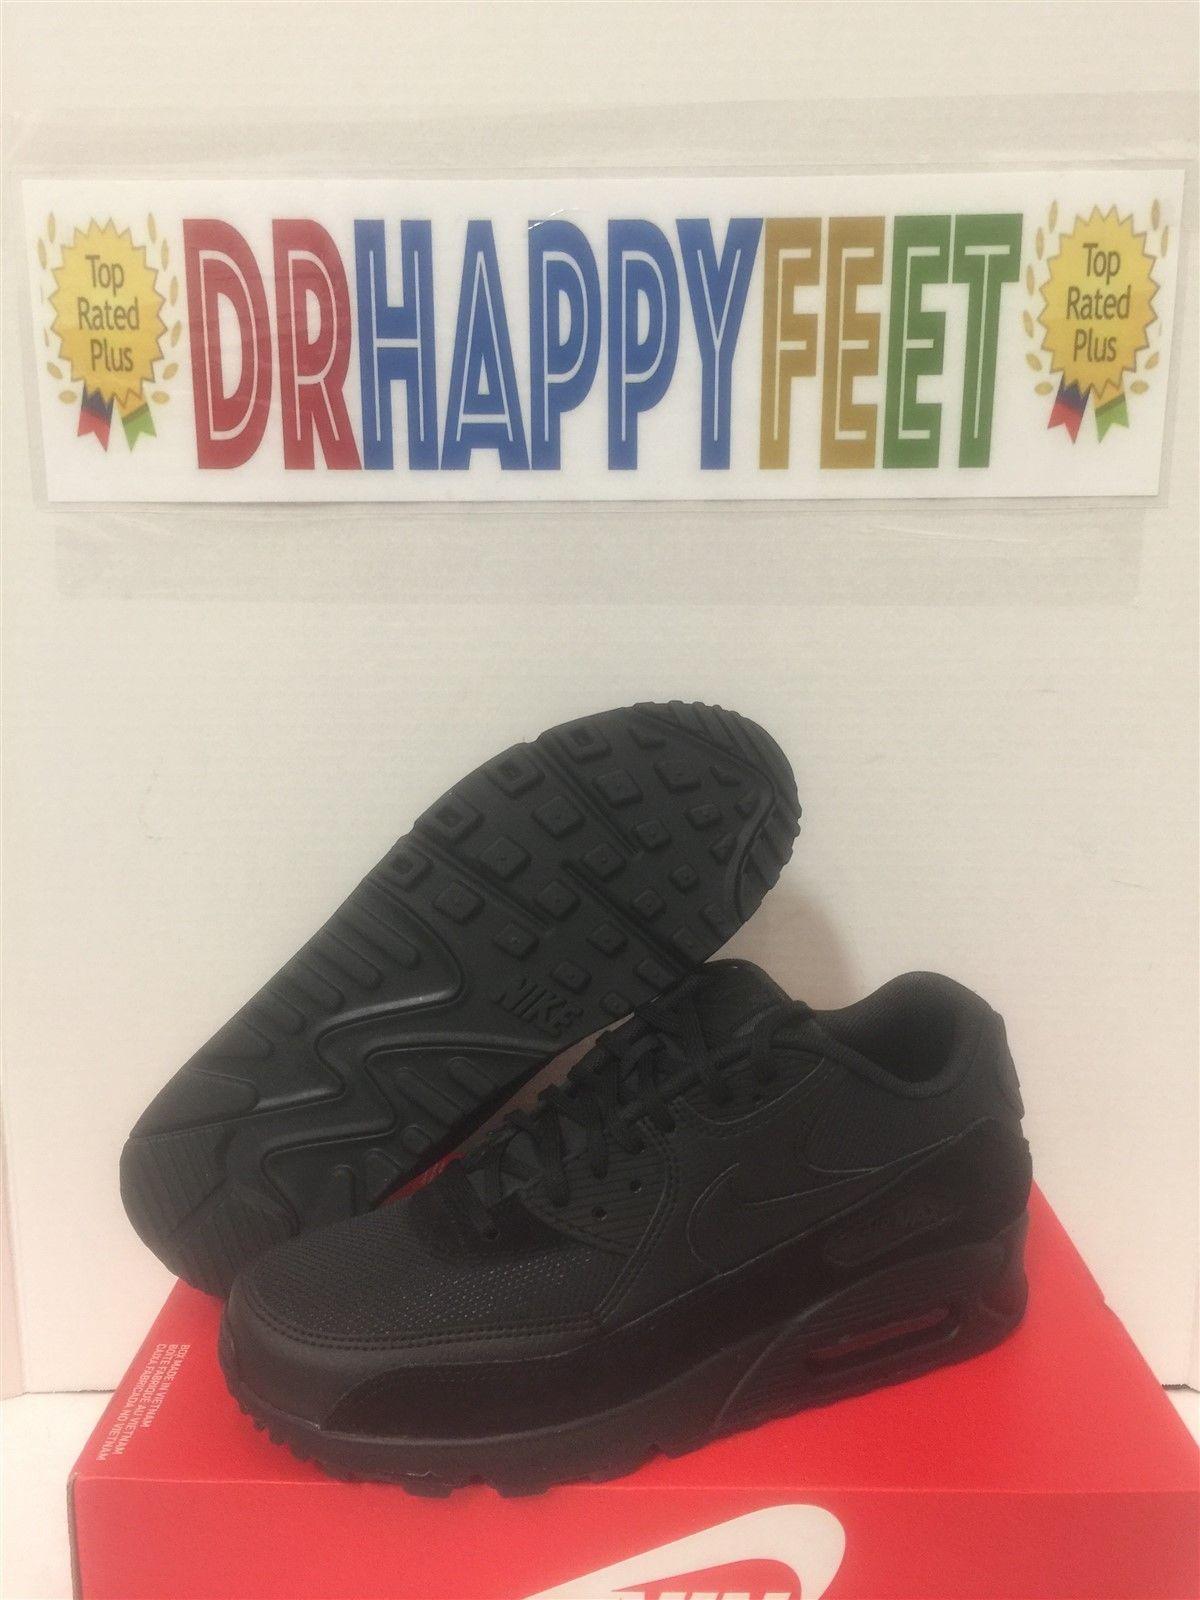 meet dae48 570a4 New Nike Air Max 90 Womens Sizes Running Shoes Triple Black Sneakers 325213  043